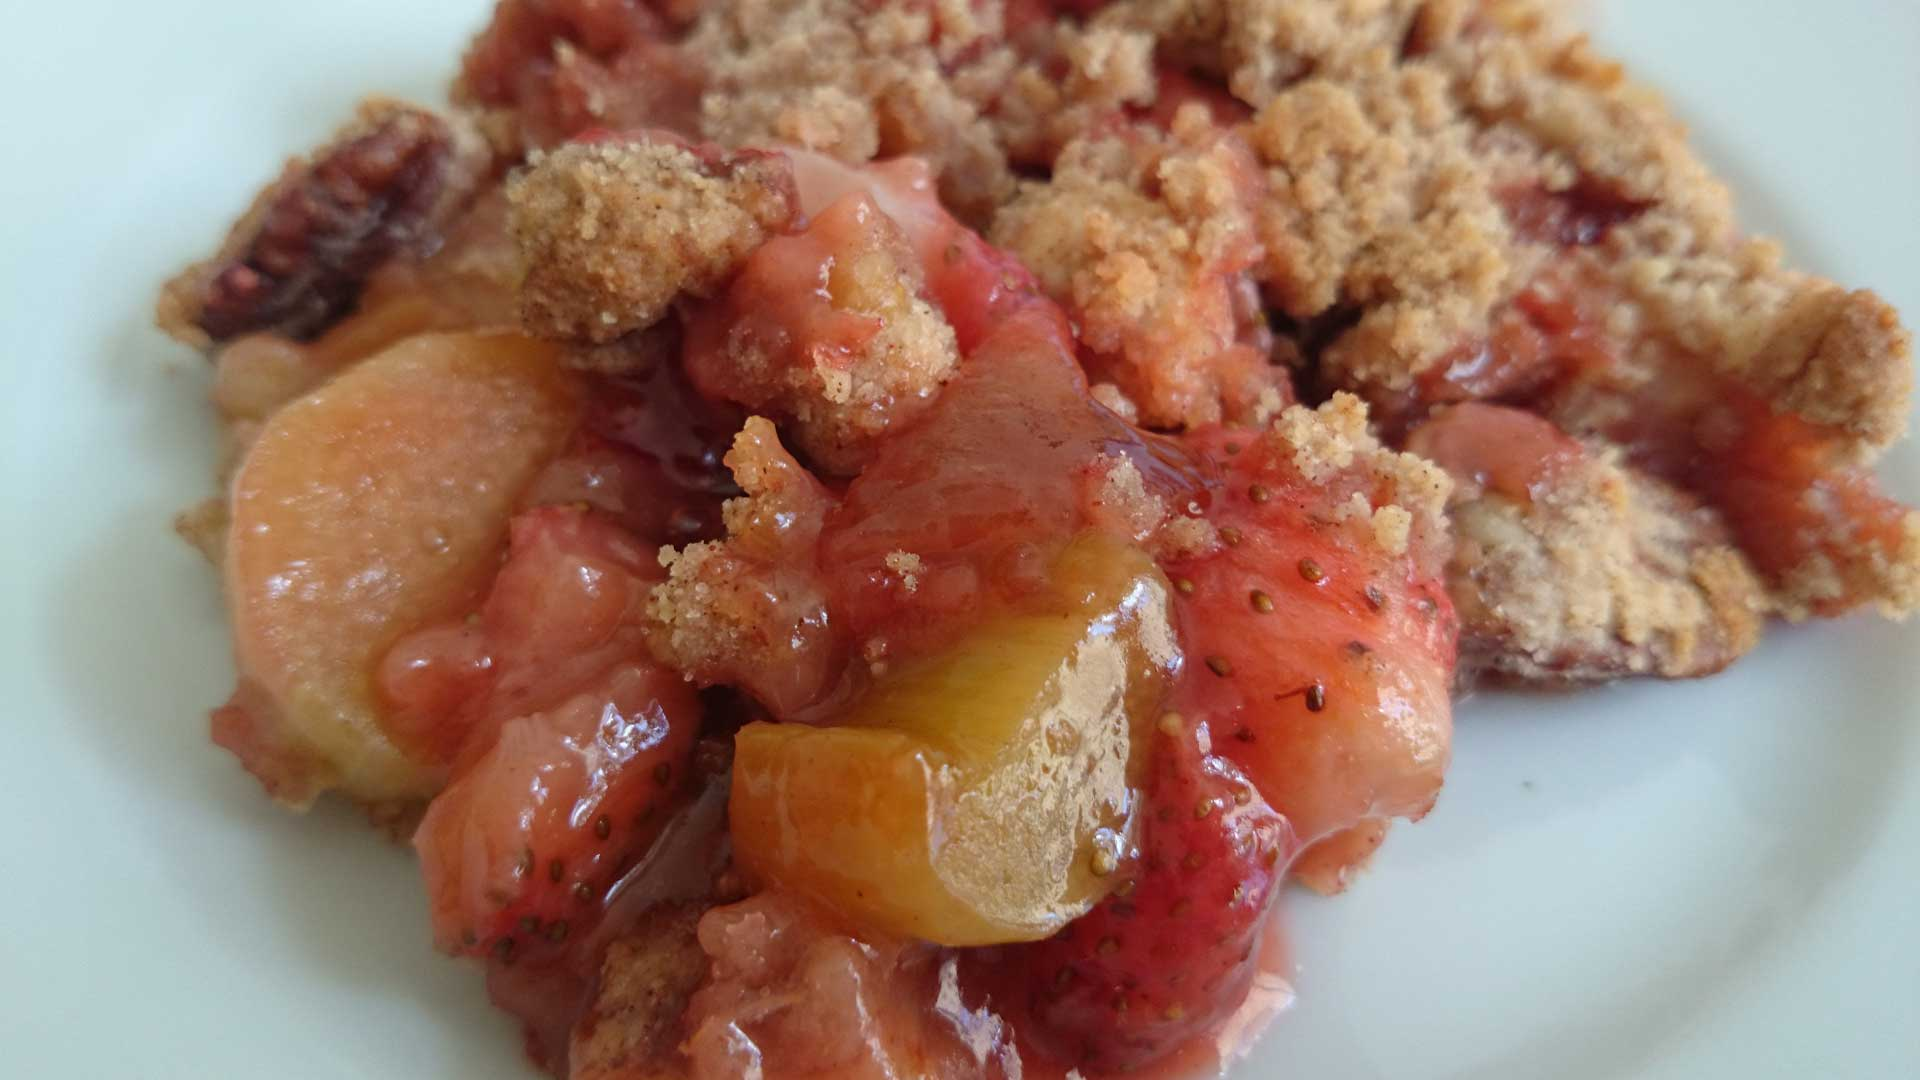 Sugar-free rhubarb strawberry crumble